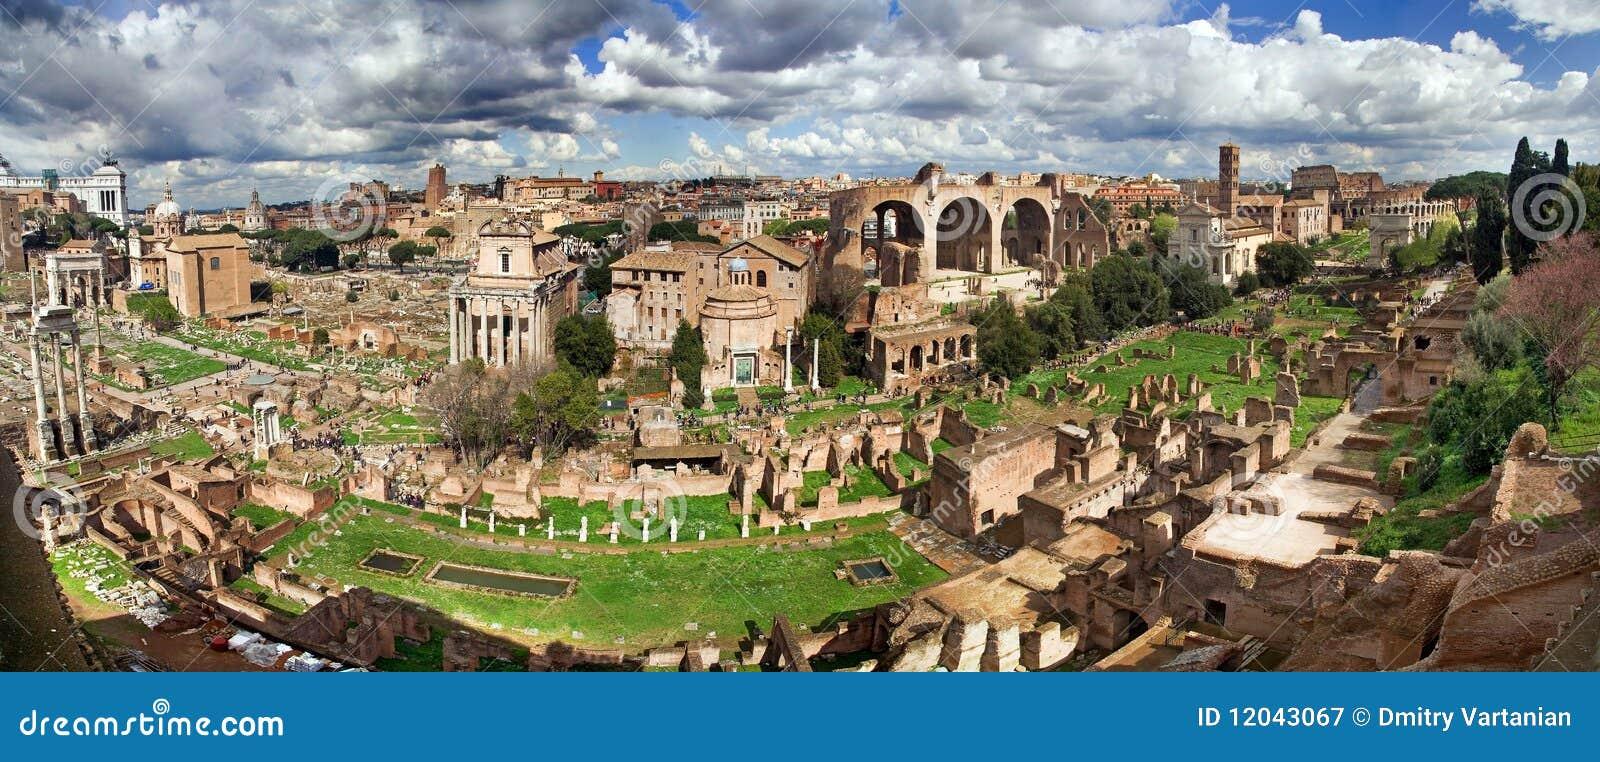 Forum wzgórza palatynu panorama rzymska